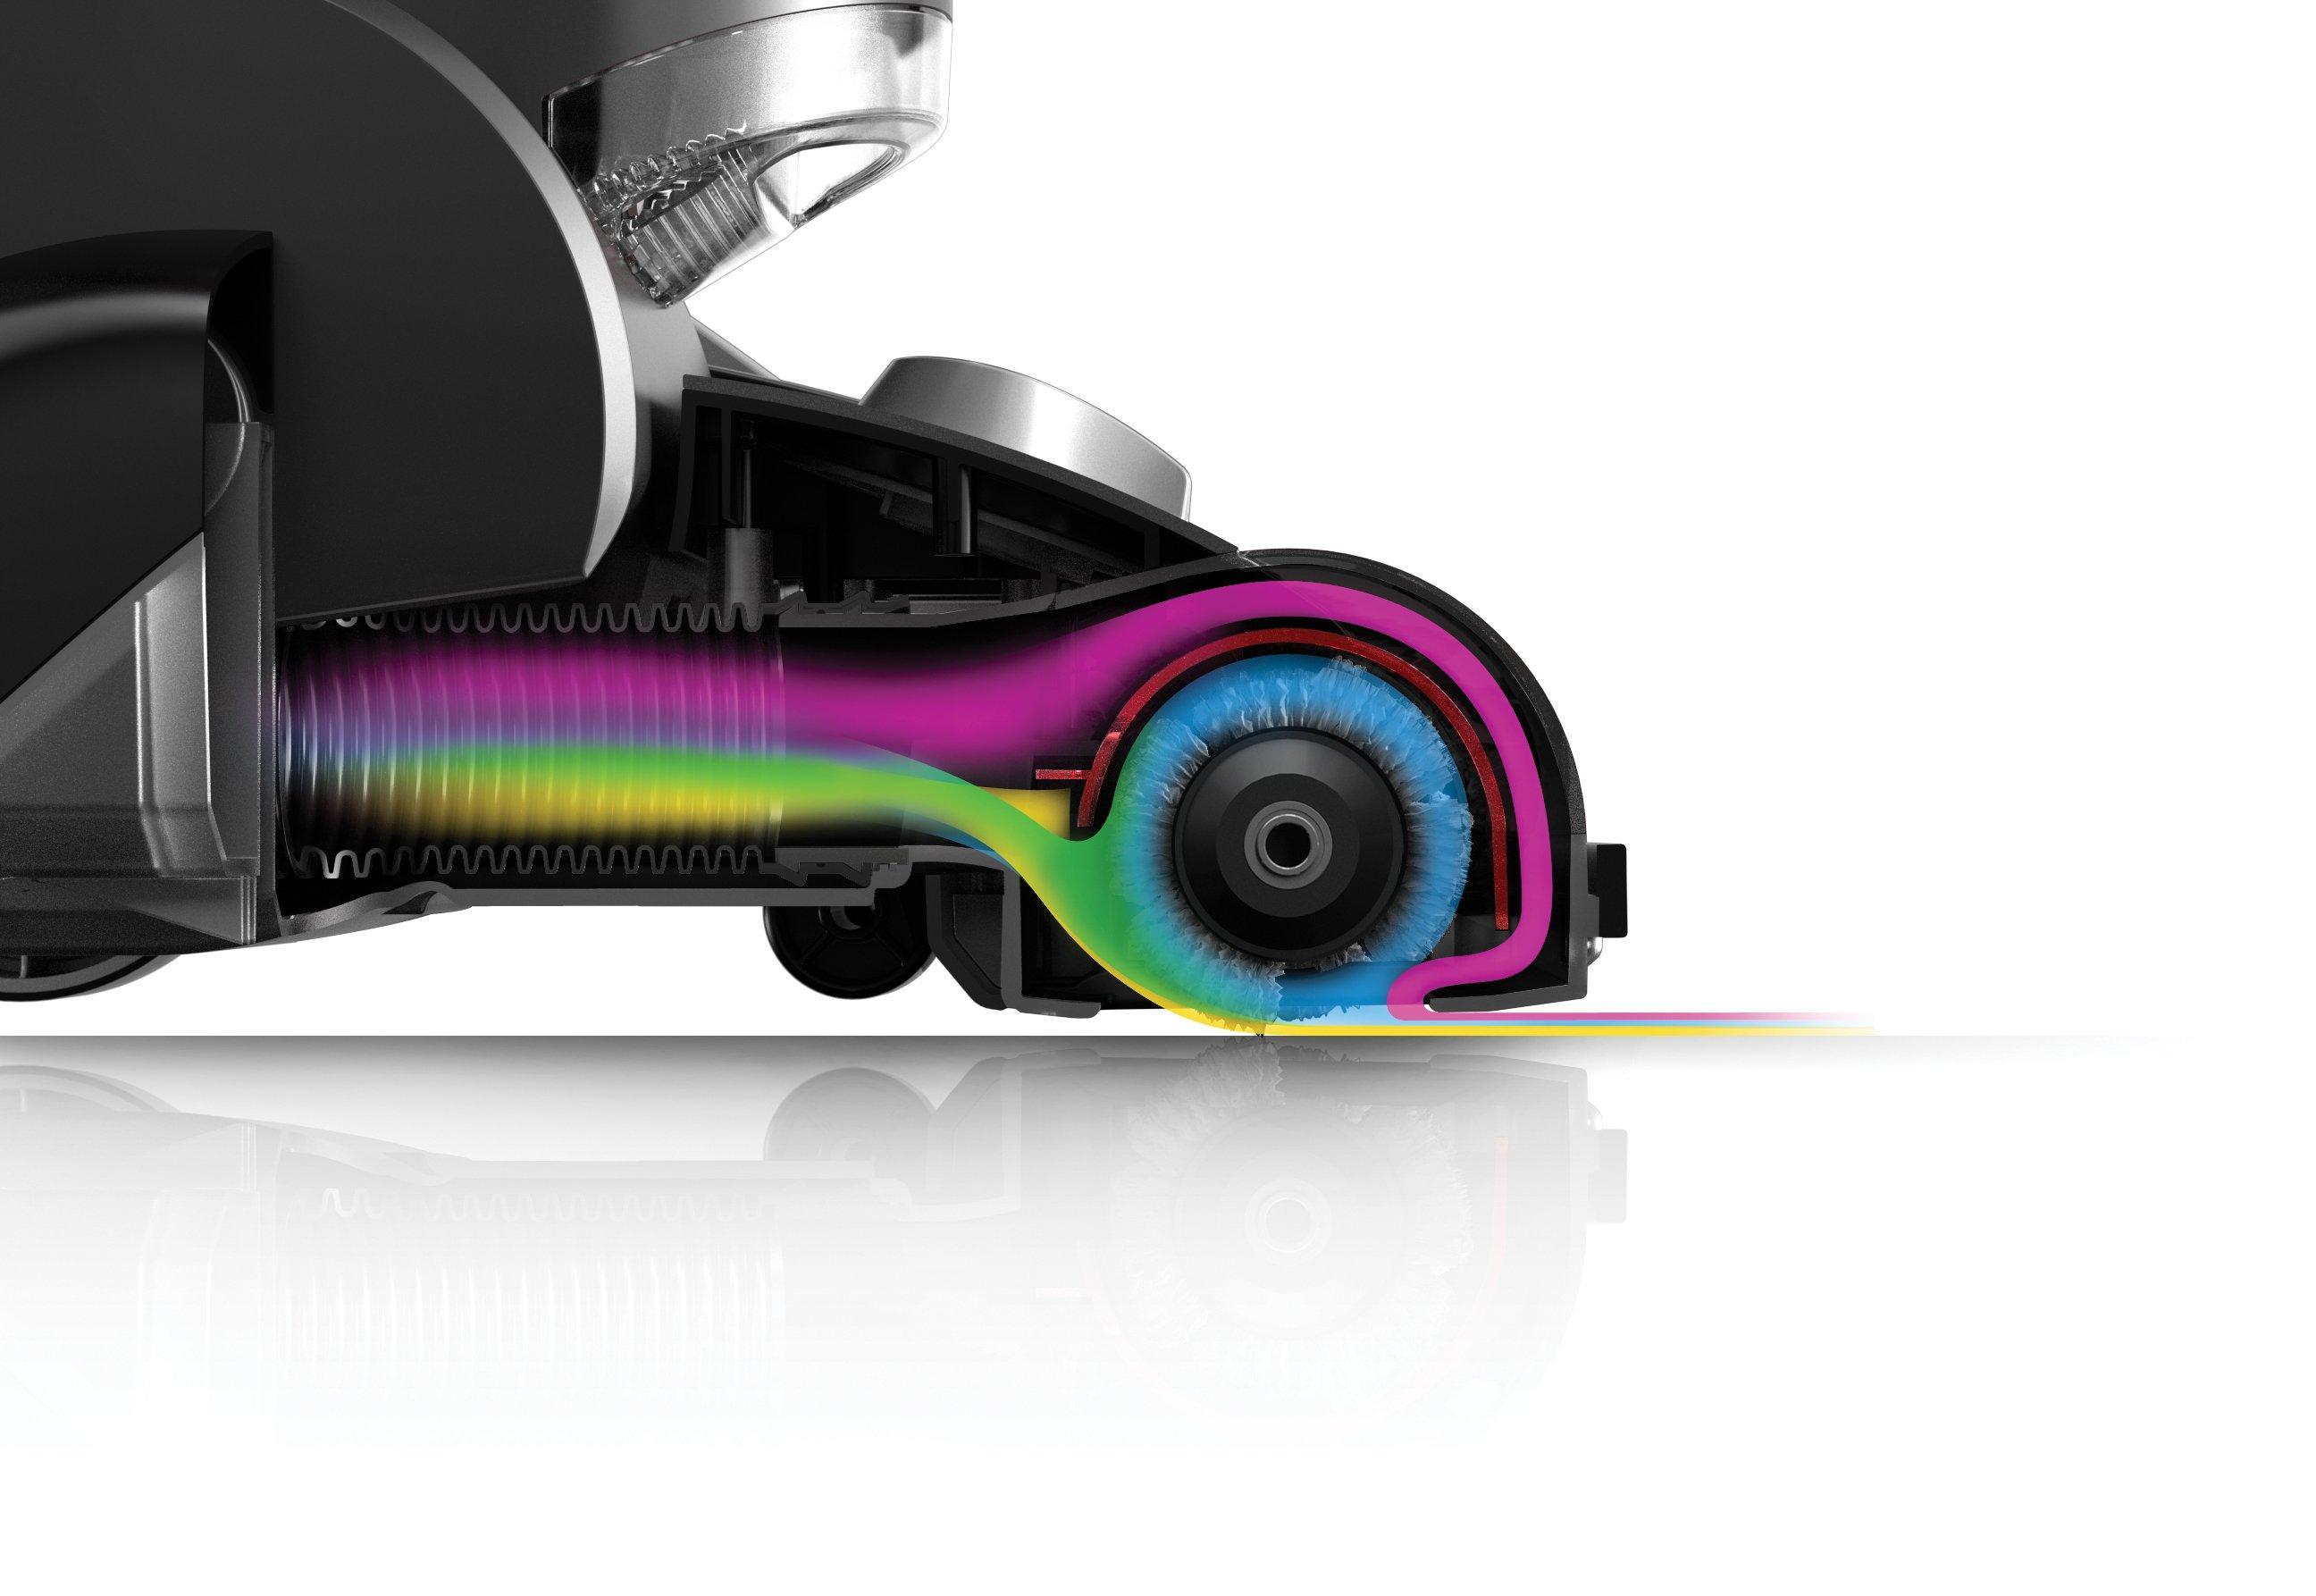 WindTunnel 3 Pro Upright Vacuum8